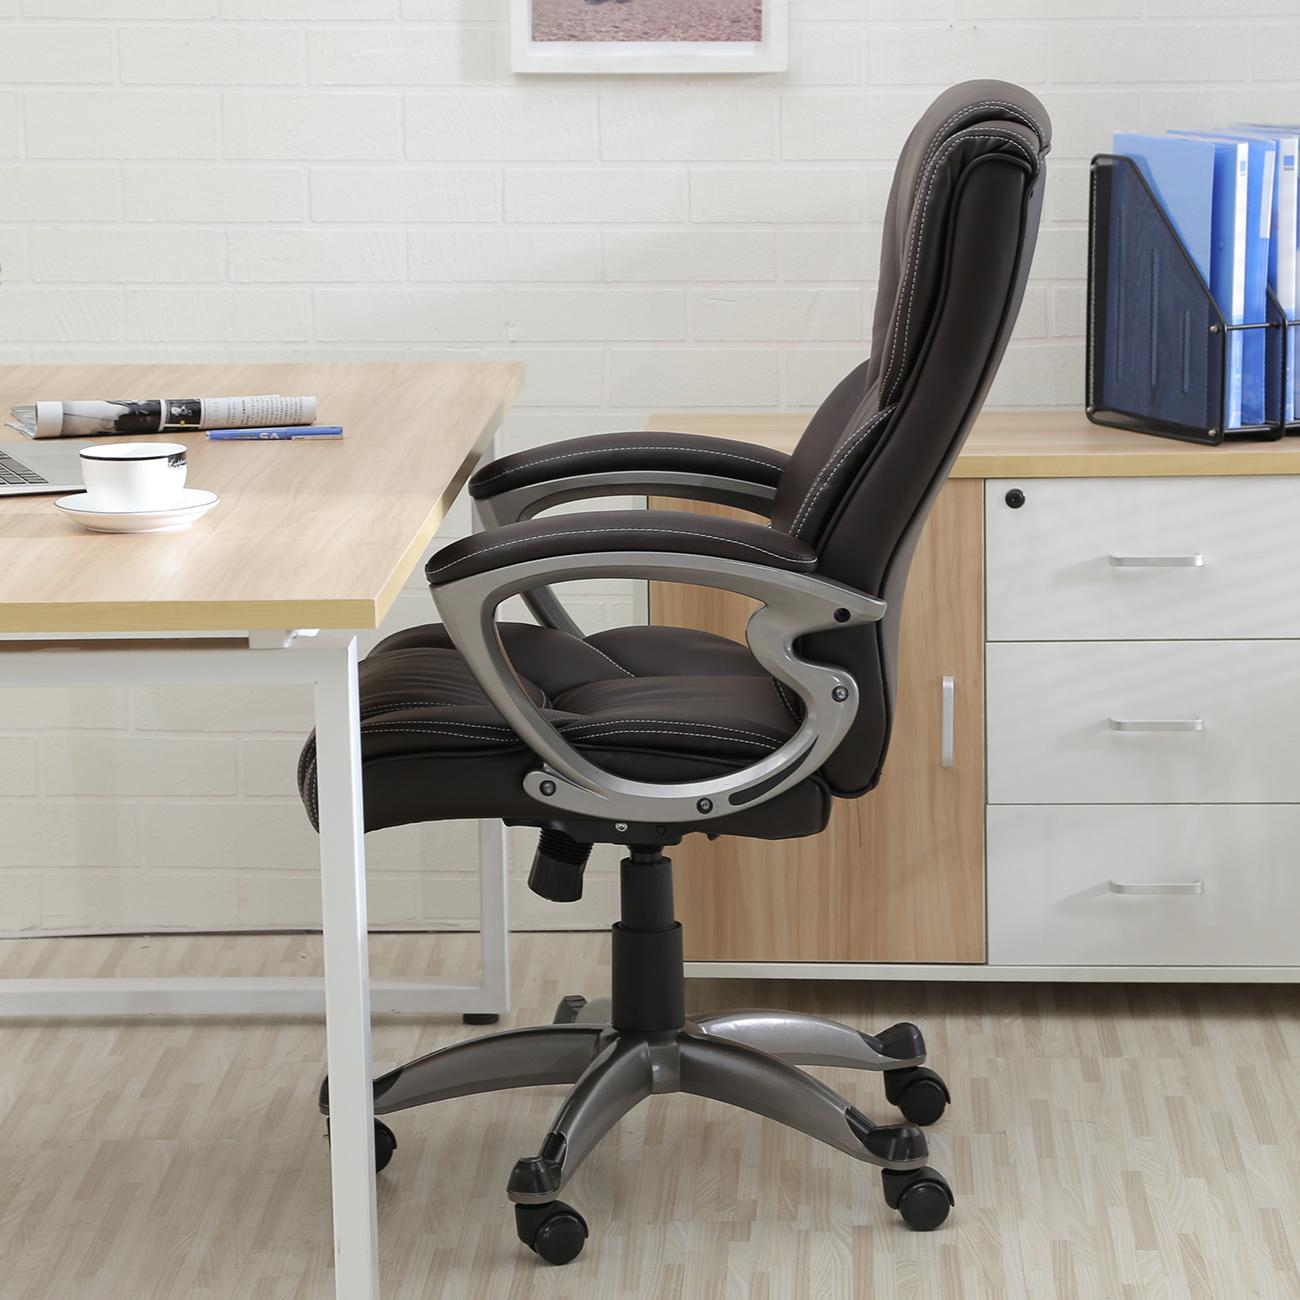 Executive Office Chair High-Back Task Ergonomic Computer Desk Study PU Leather